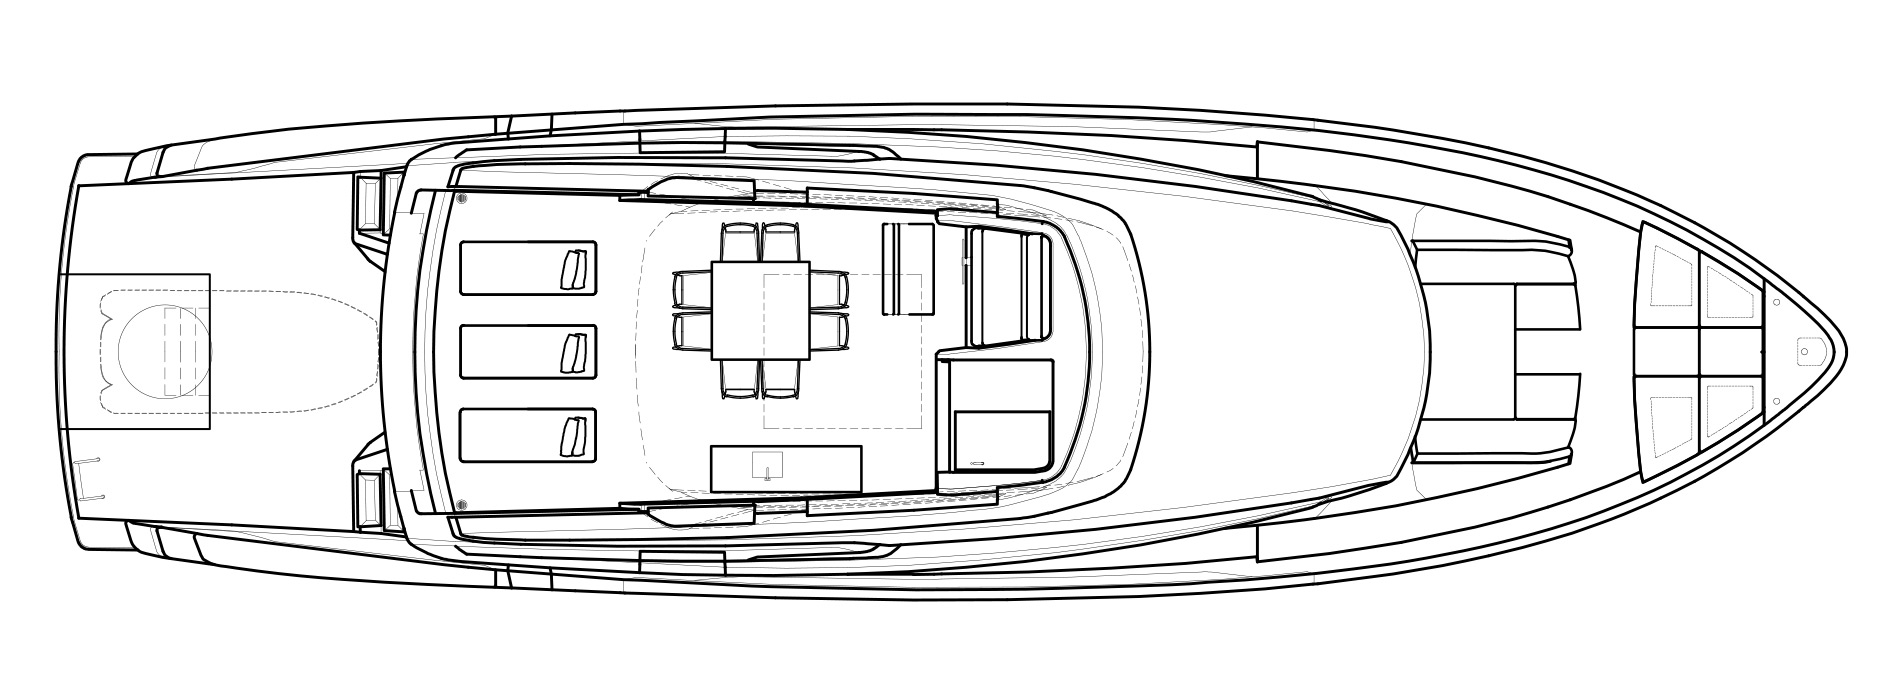 Sanlorenzo Yachts SX76 飞桥 Versione A